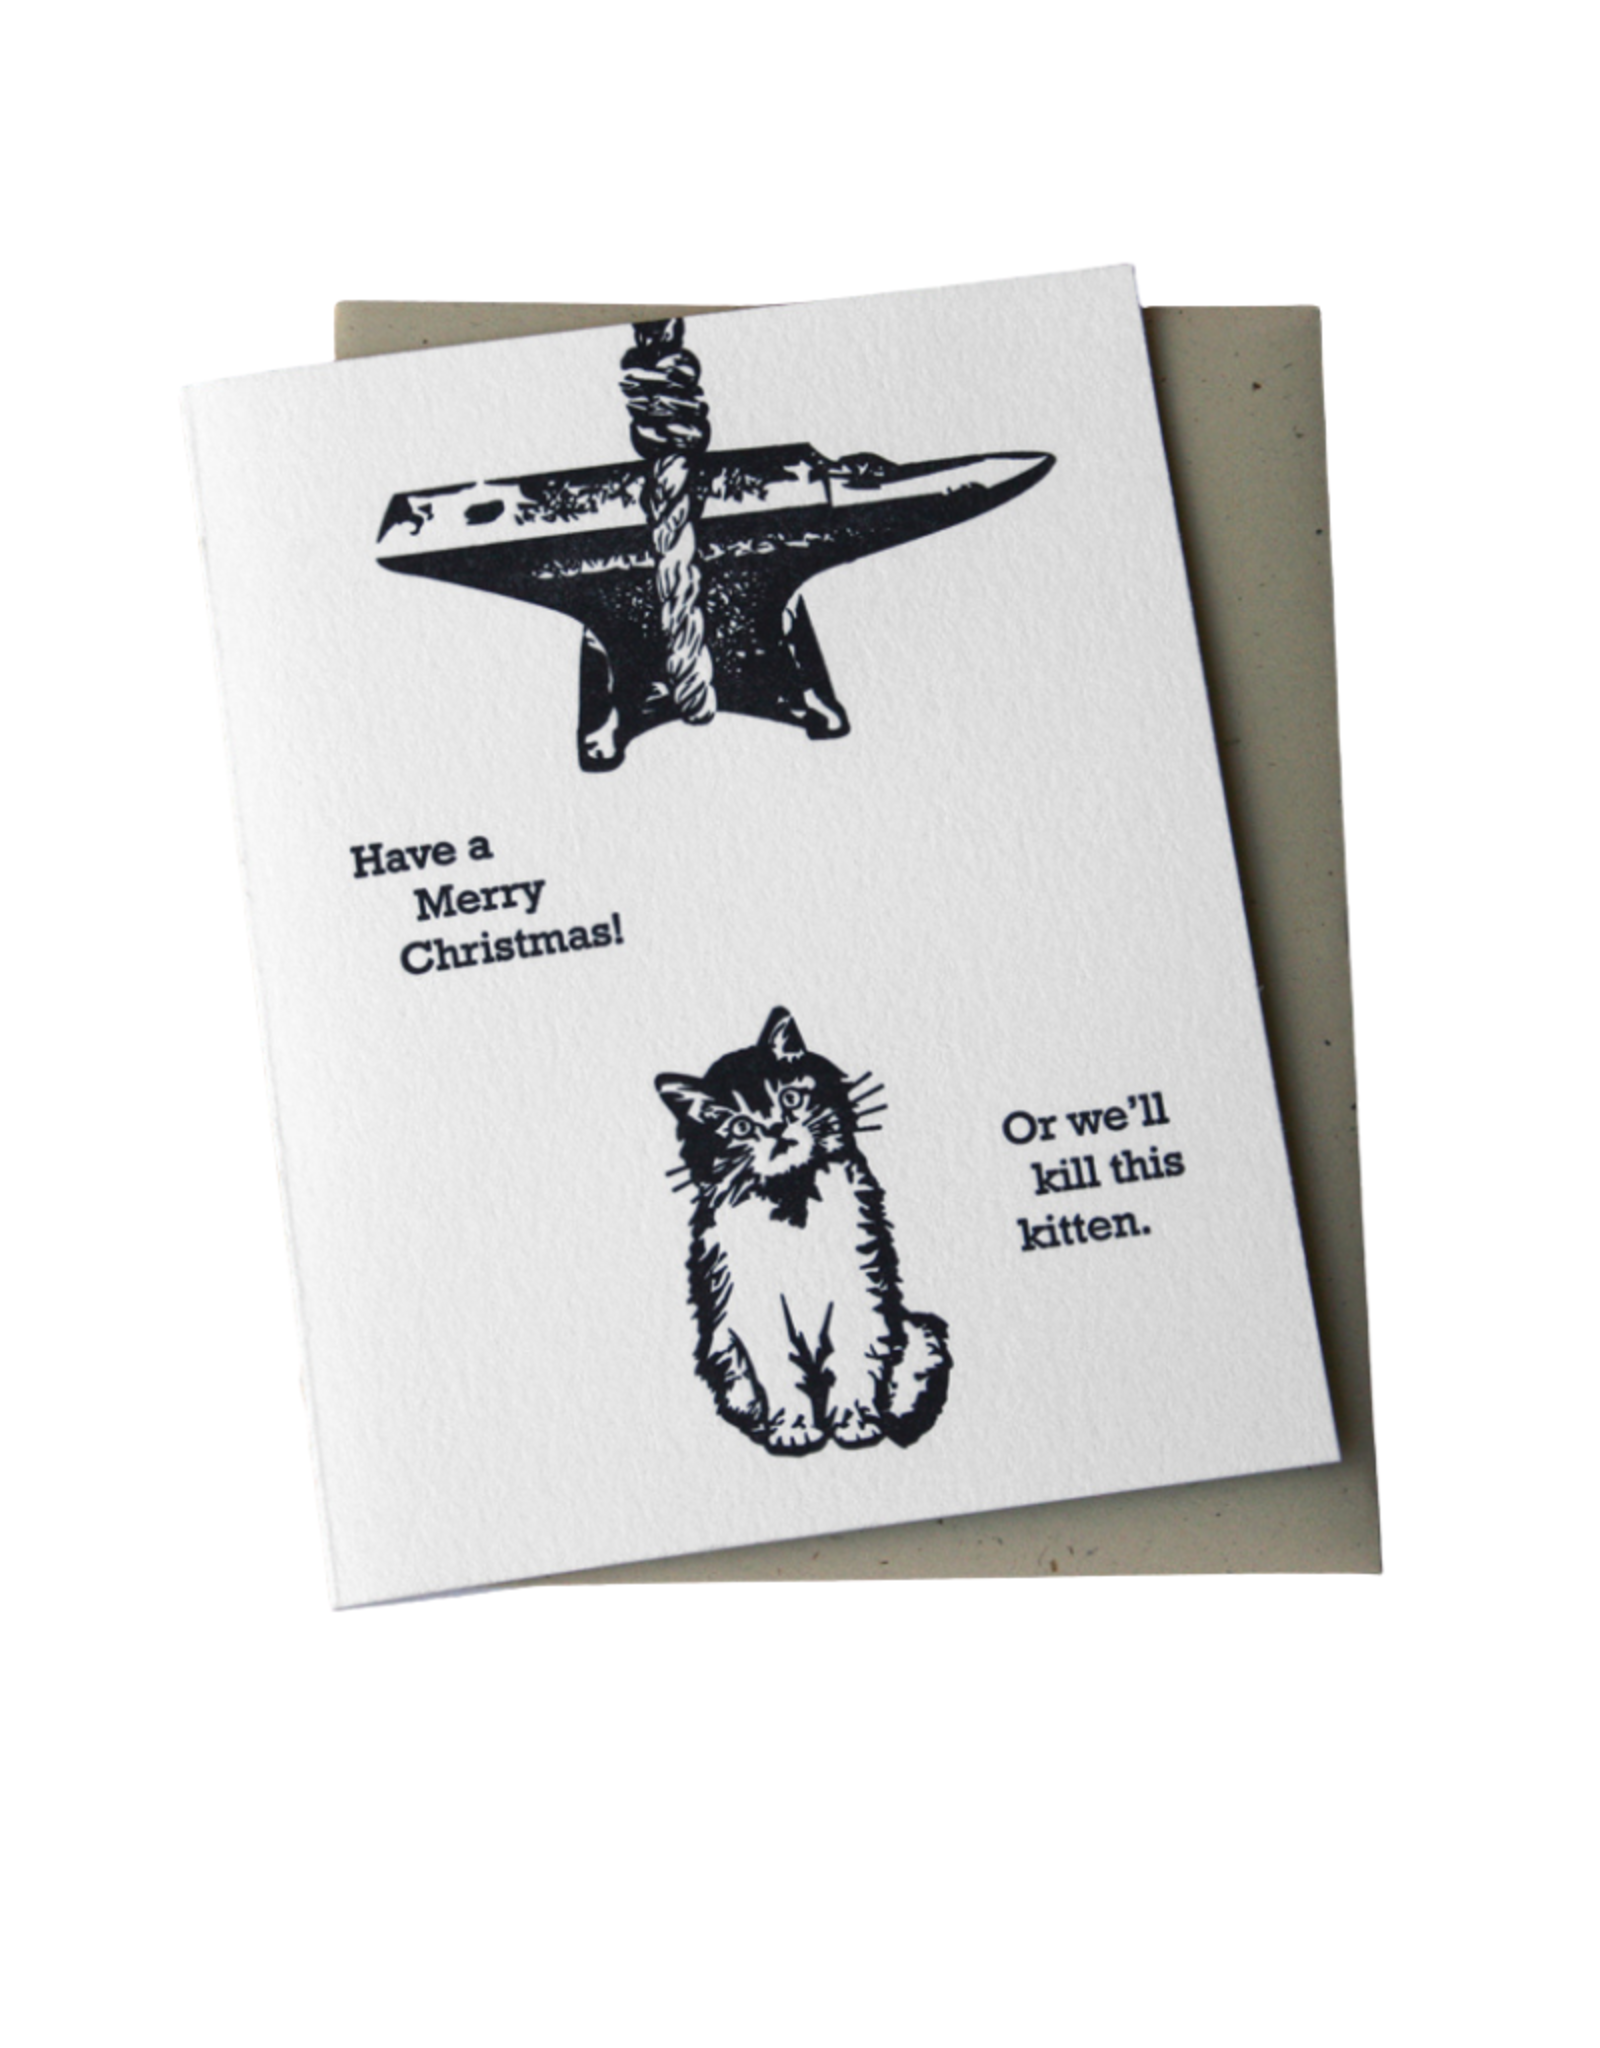 McBitterson's Christmas Kitten